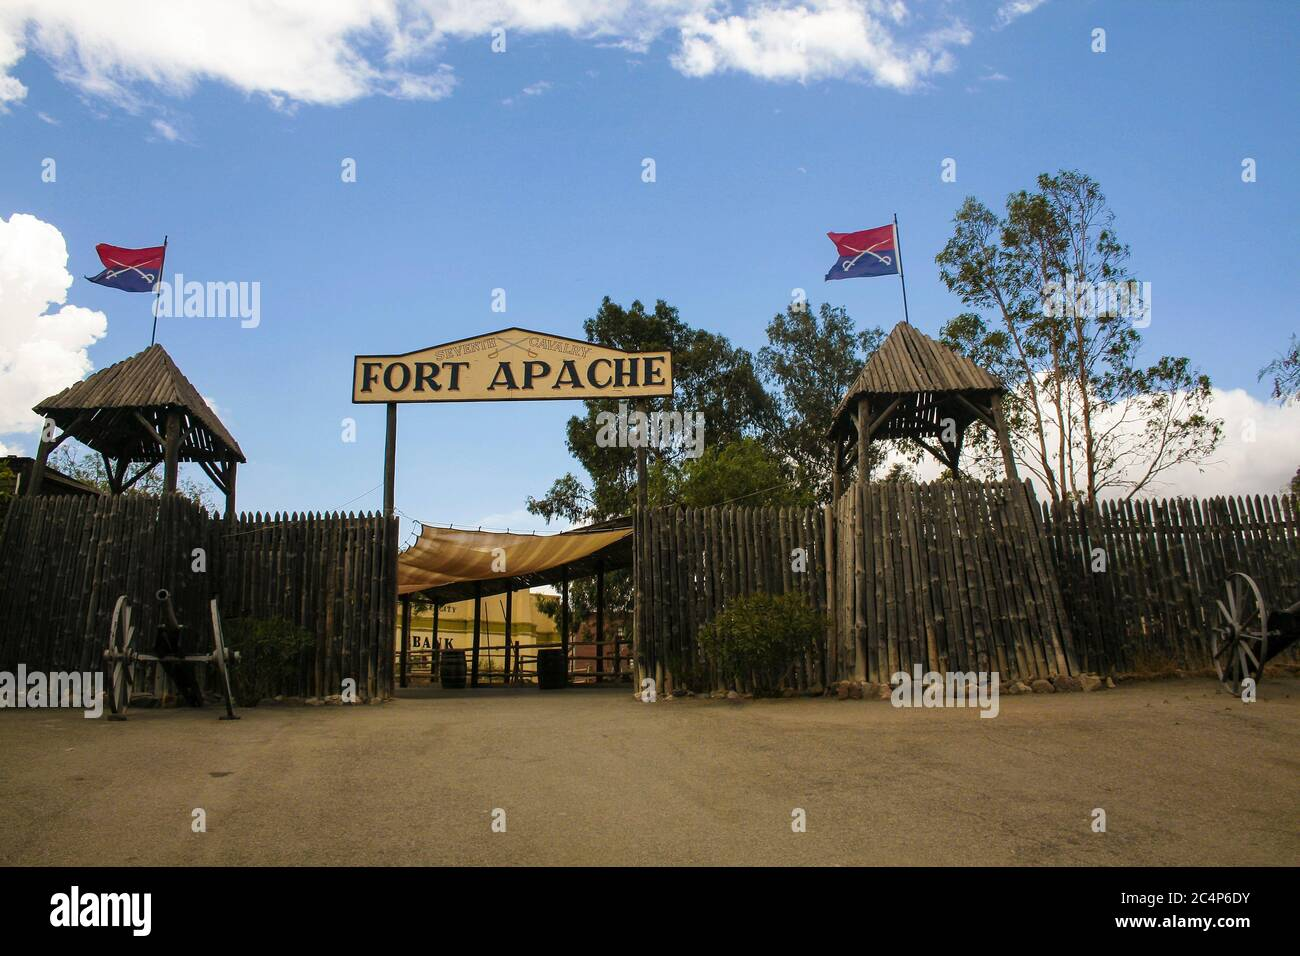 Province of Almería, Andalusia, Spain, Europe. Tabernas Desert (Desierto de Tabernas). Mini Hollywood film set, western theme park. The entrance to Fort Apache (reconstruction). Stock Photo